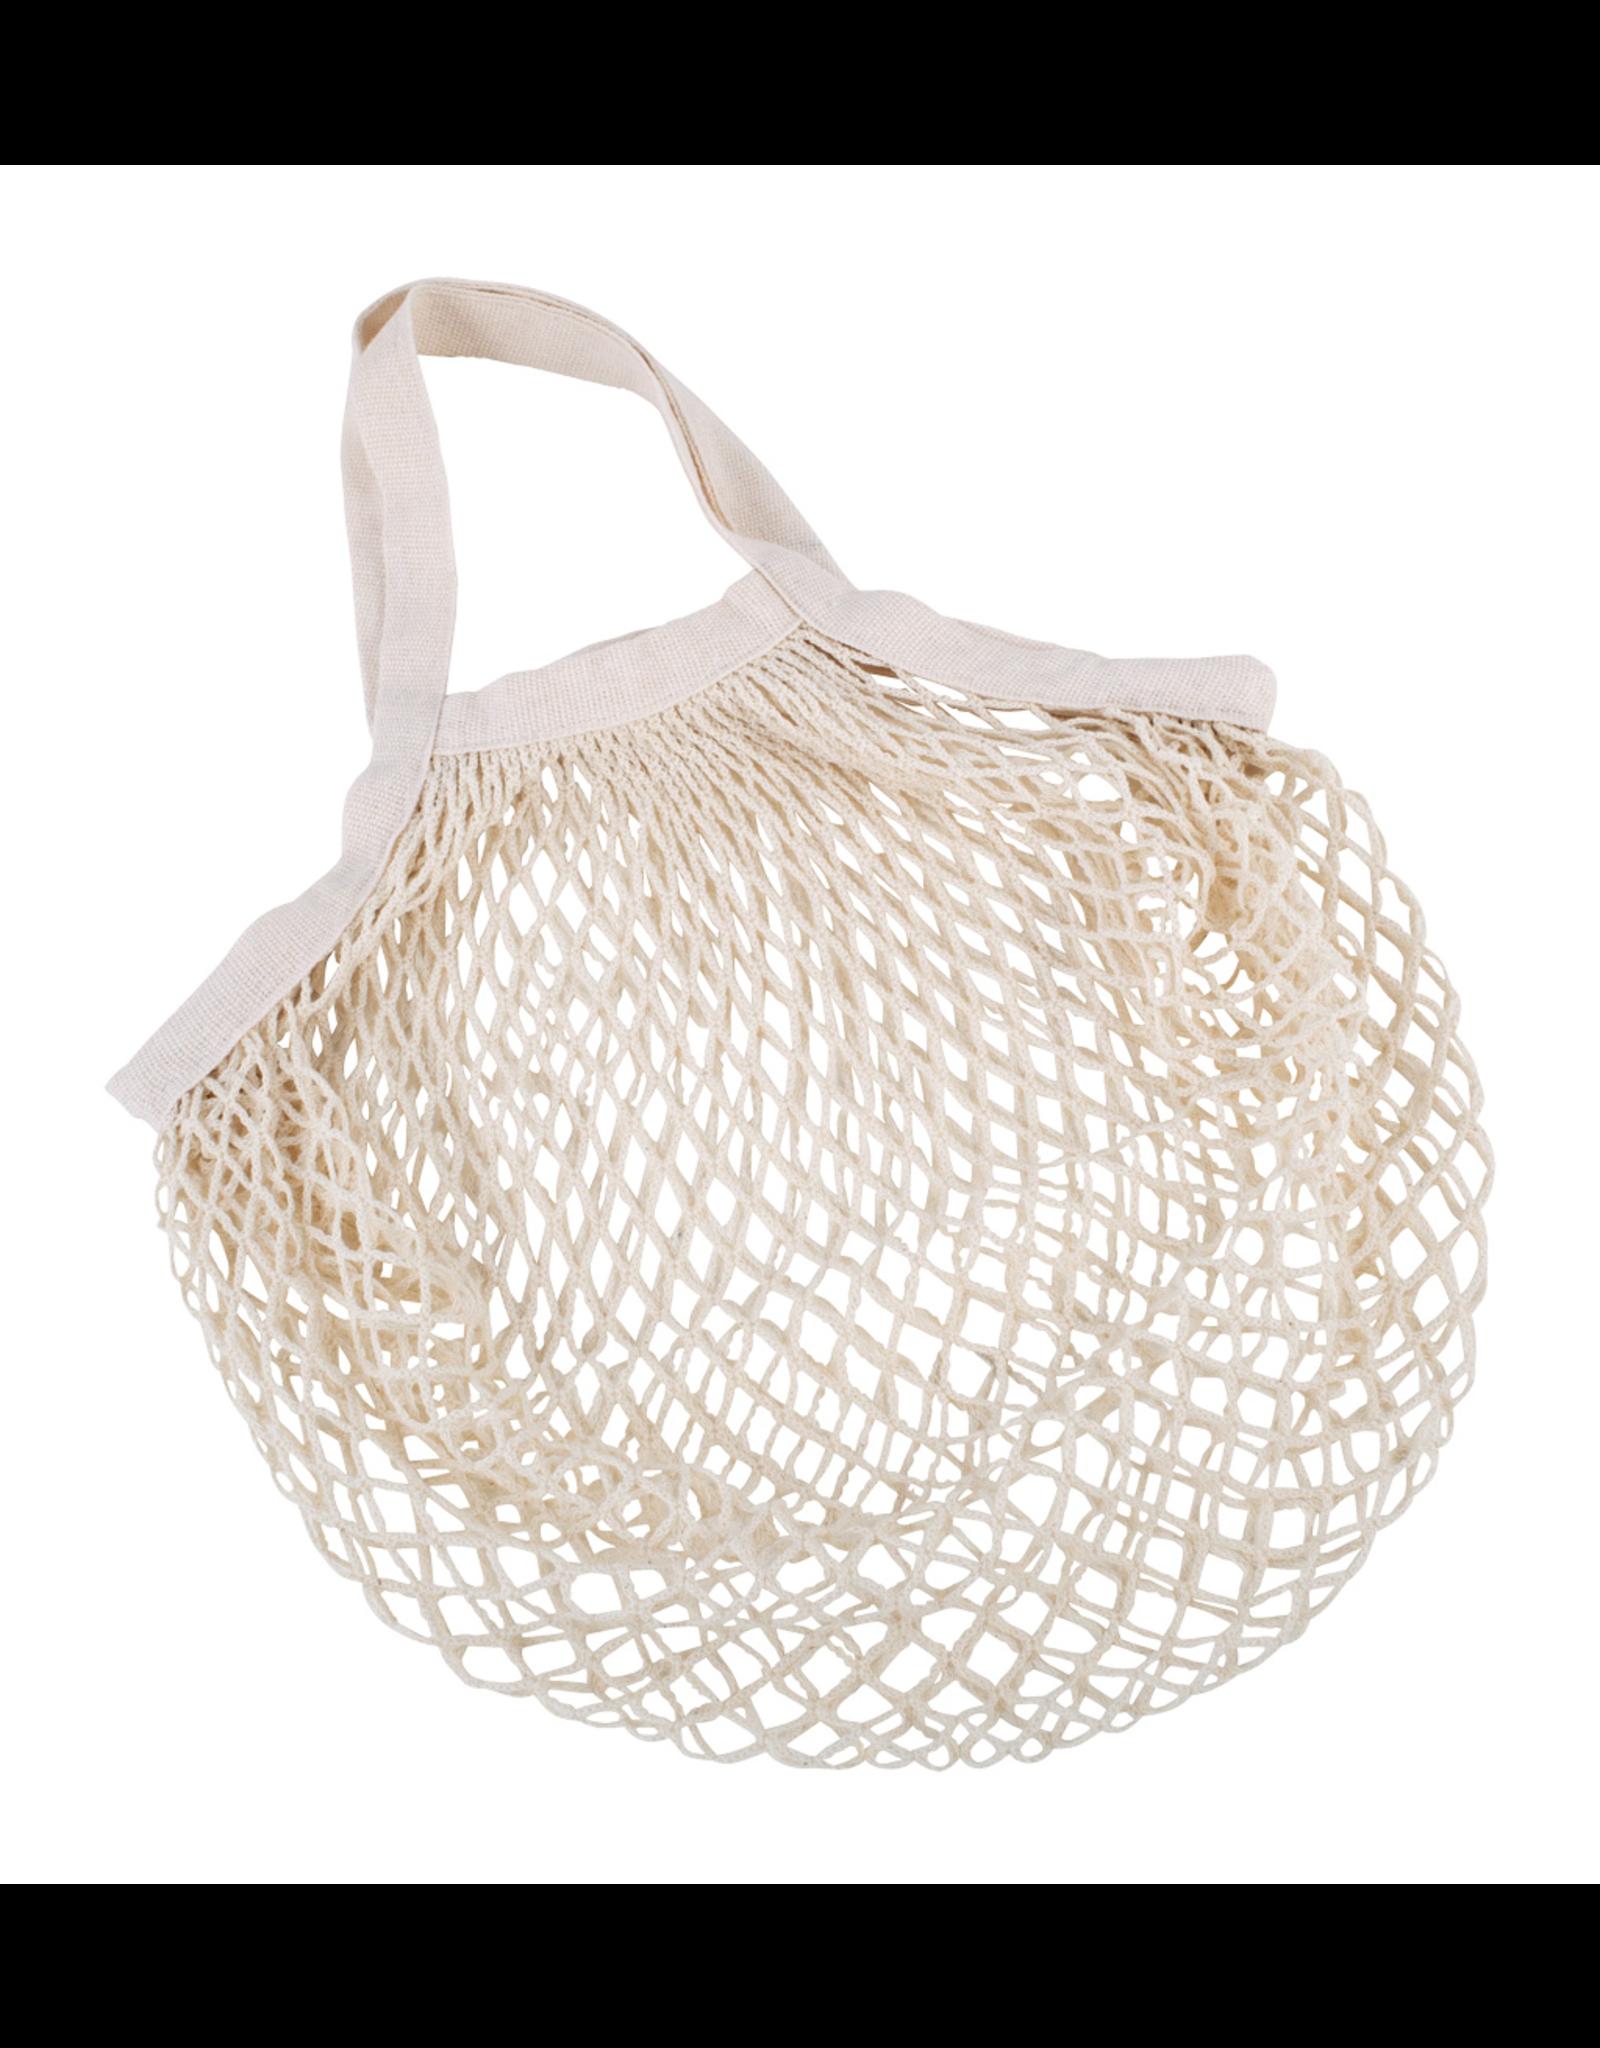 Redecker Cotton Shopping Net